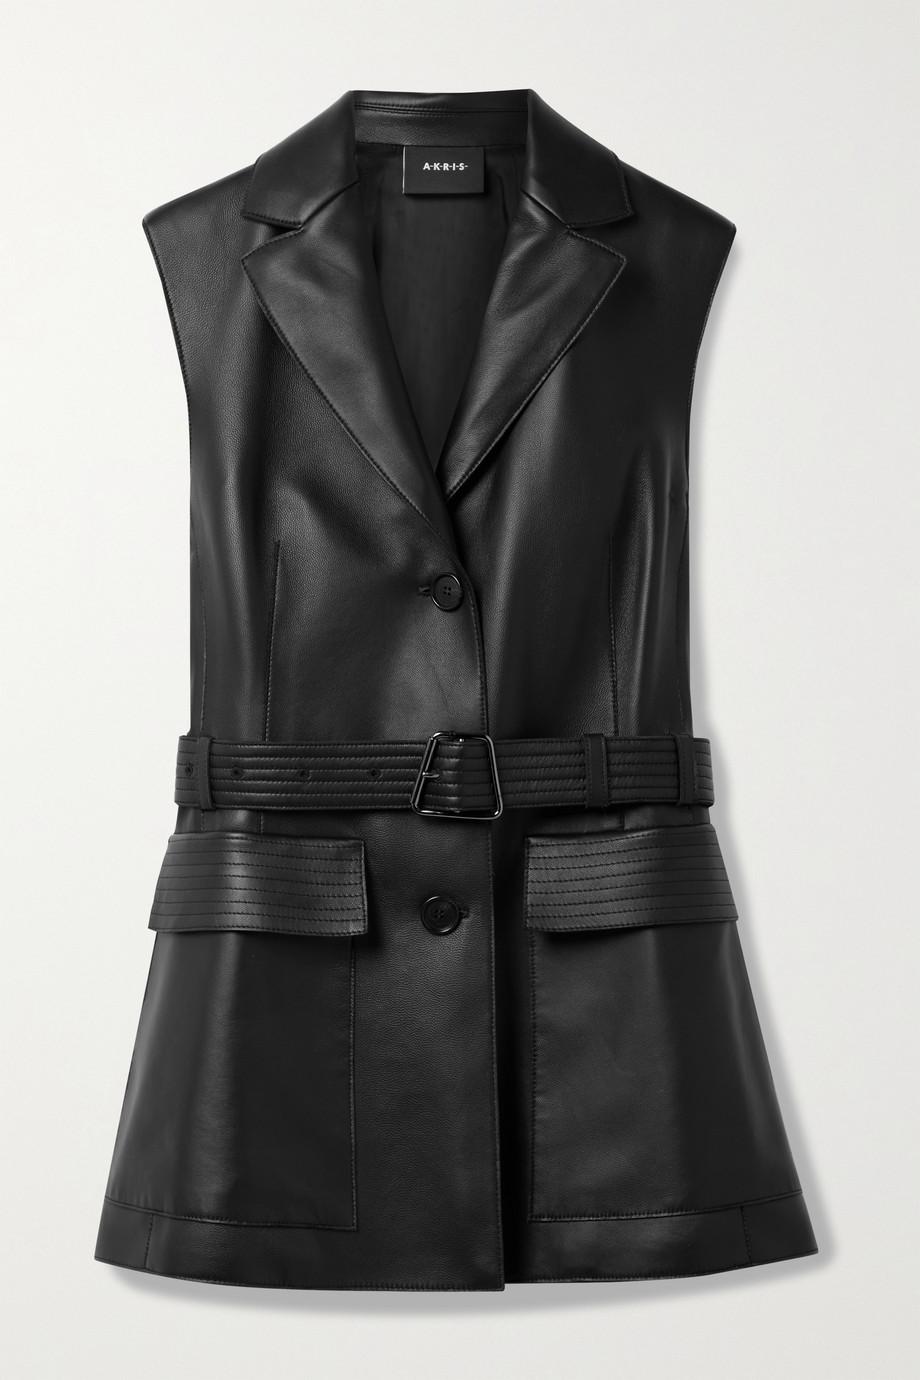 Akris Natalina belted leather vest